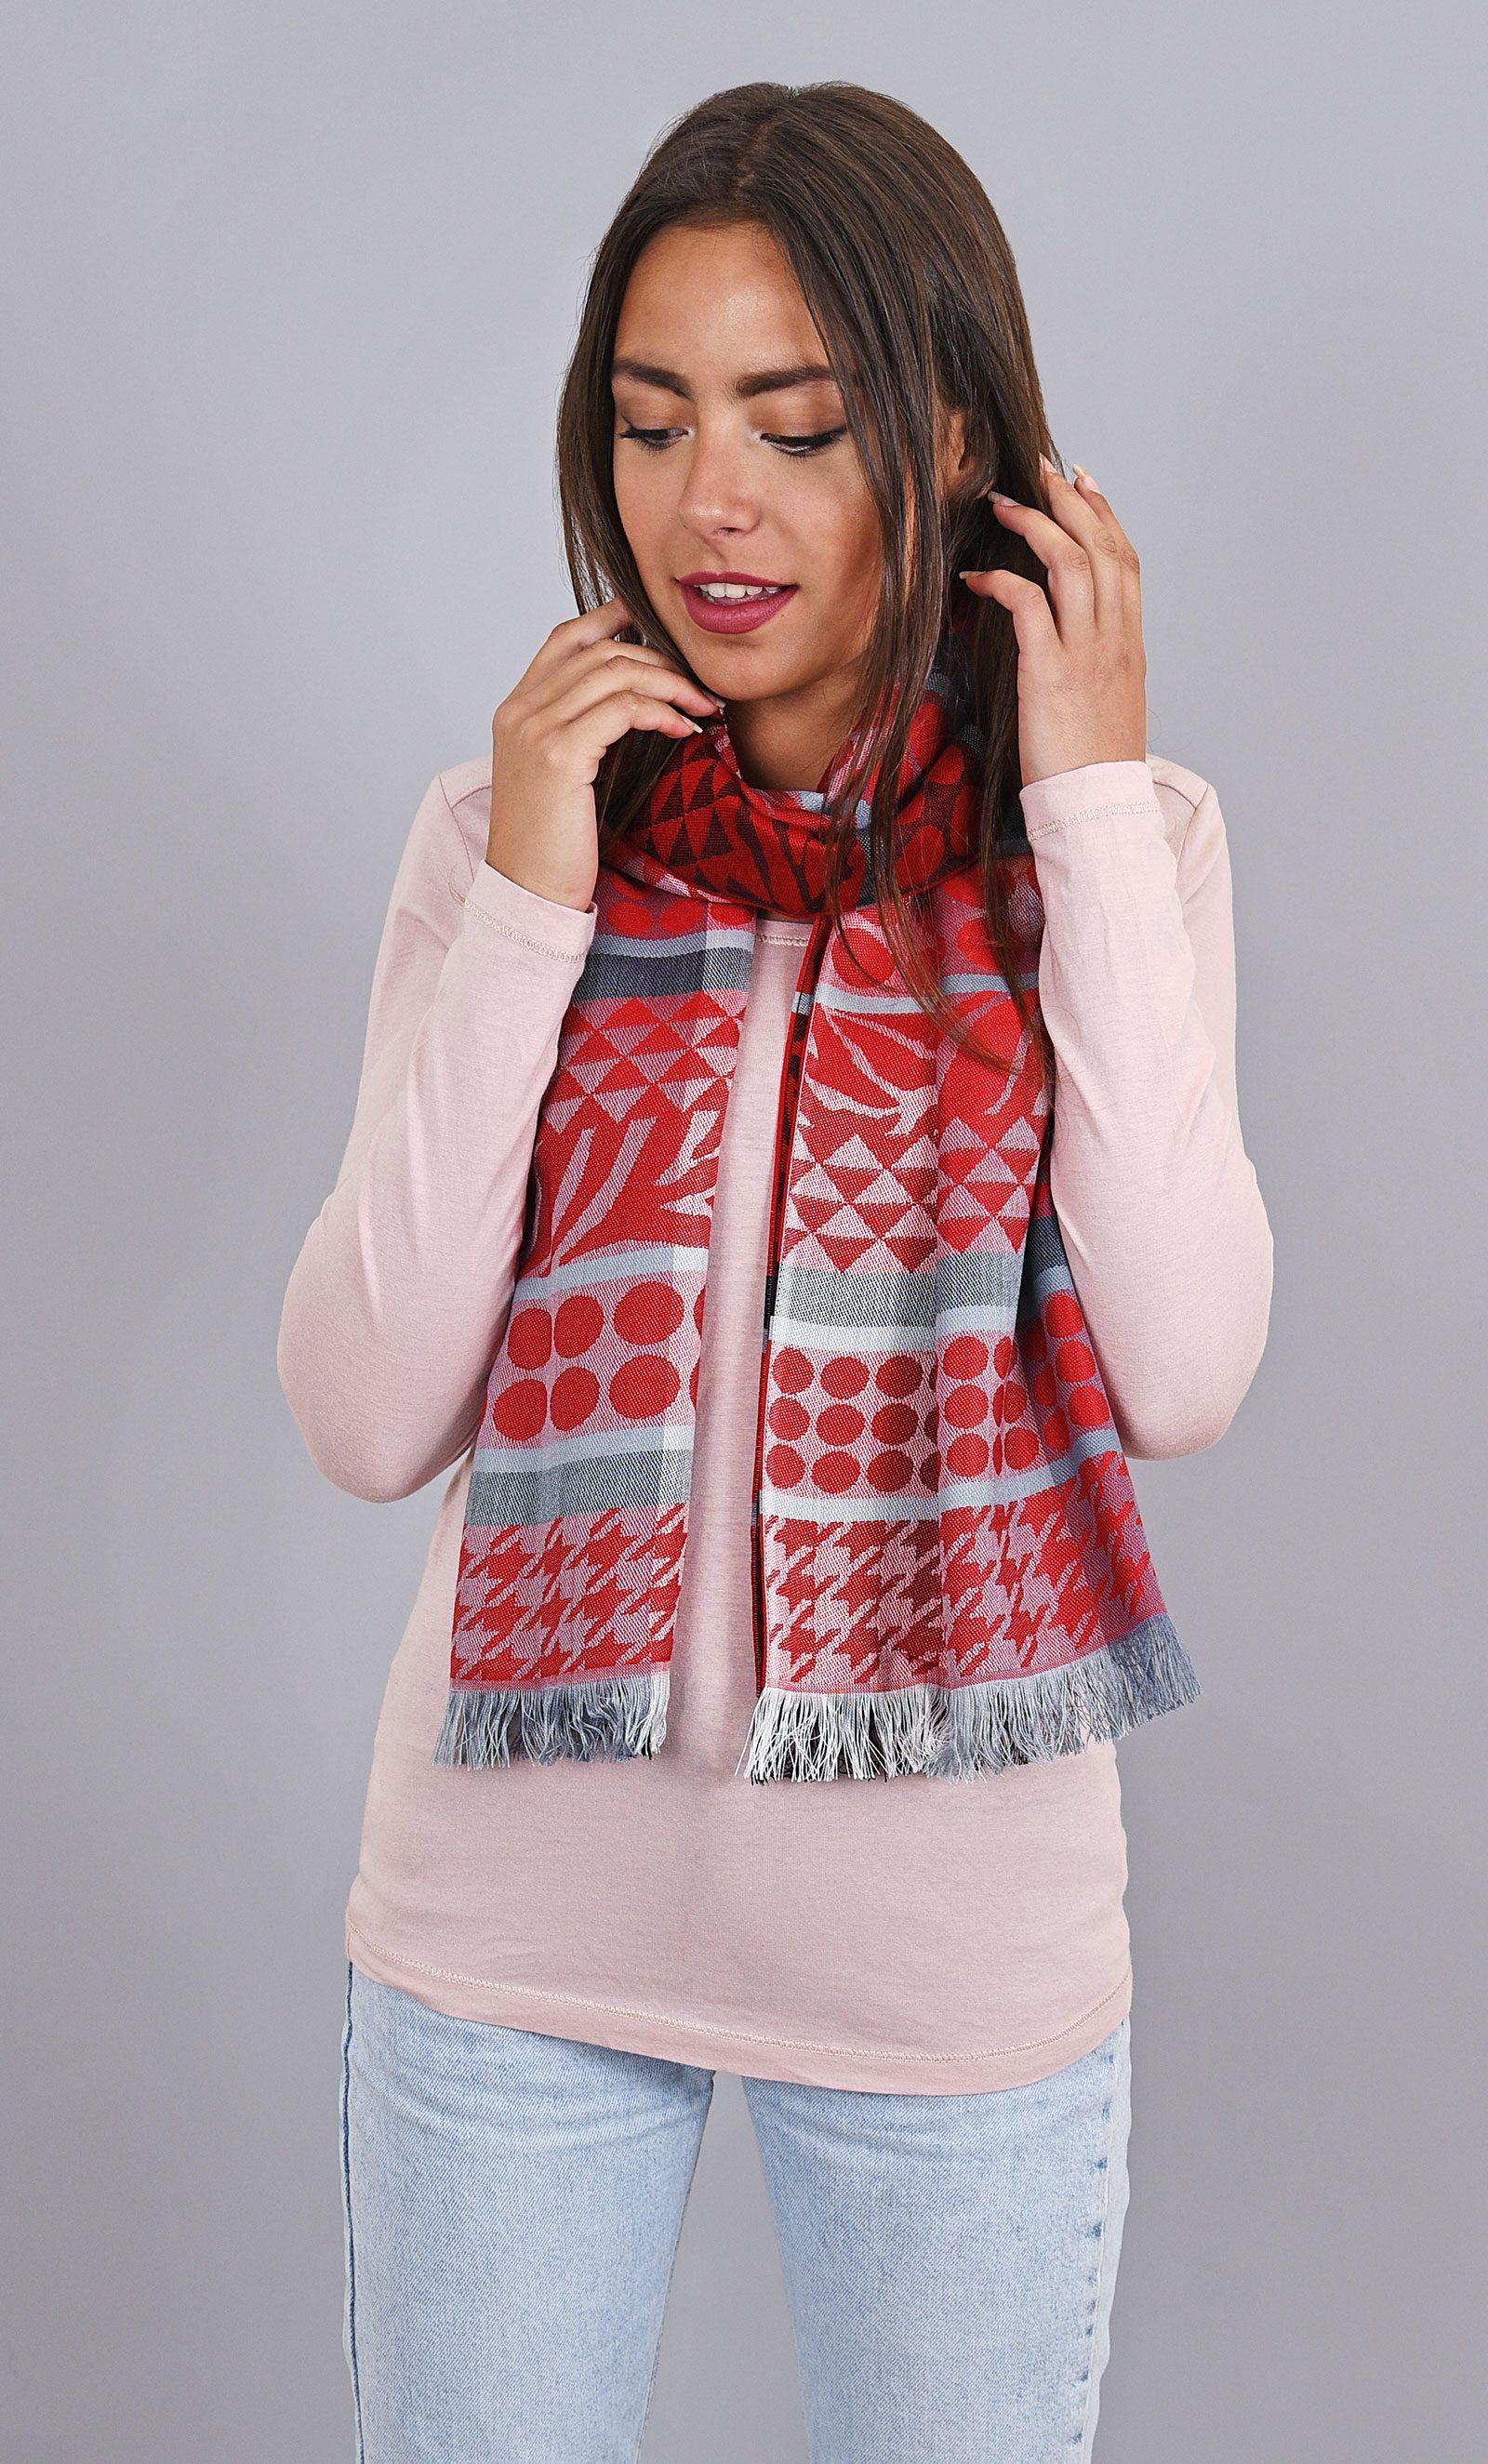 http://chantier.allee-du-foulard.fr/wp-content/uploads/2017/09/0622-ADF-Accessoire-de-mode-LB-QLC-carcela-1600x2650px-1600x2650.jpg